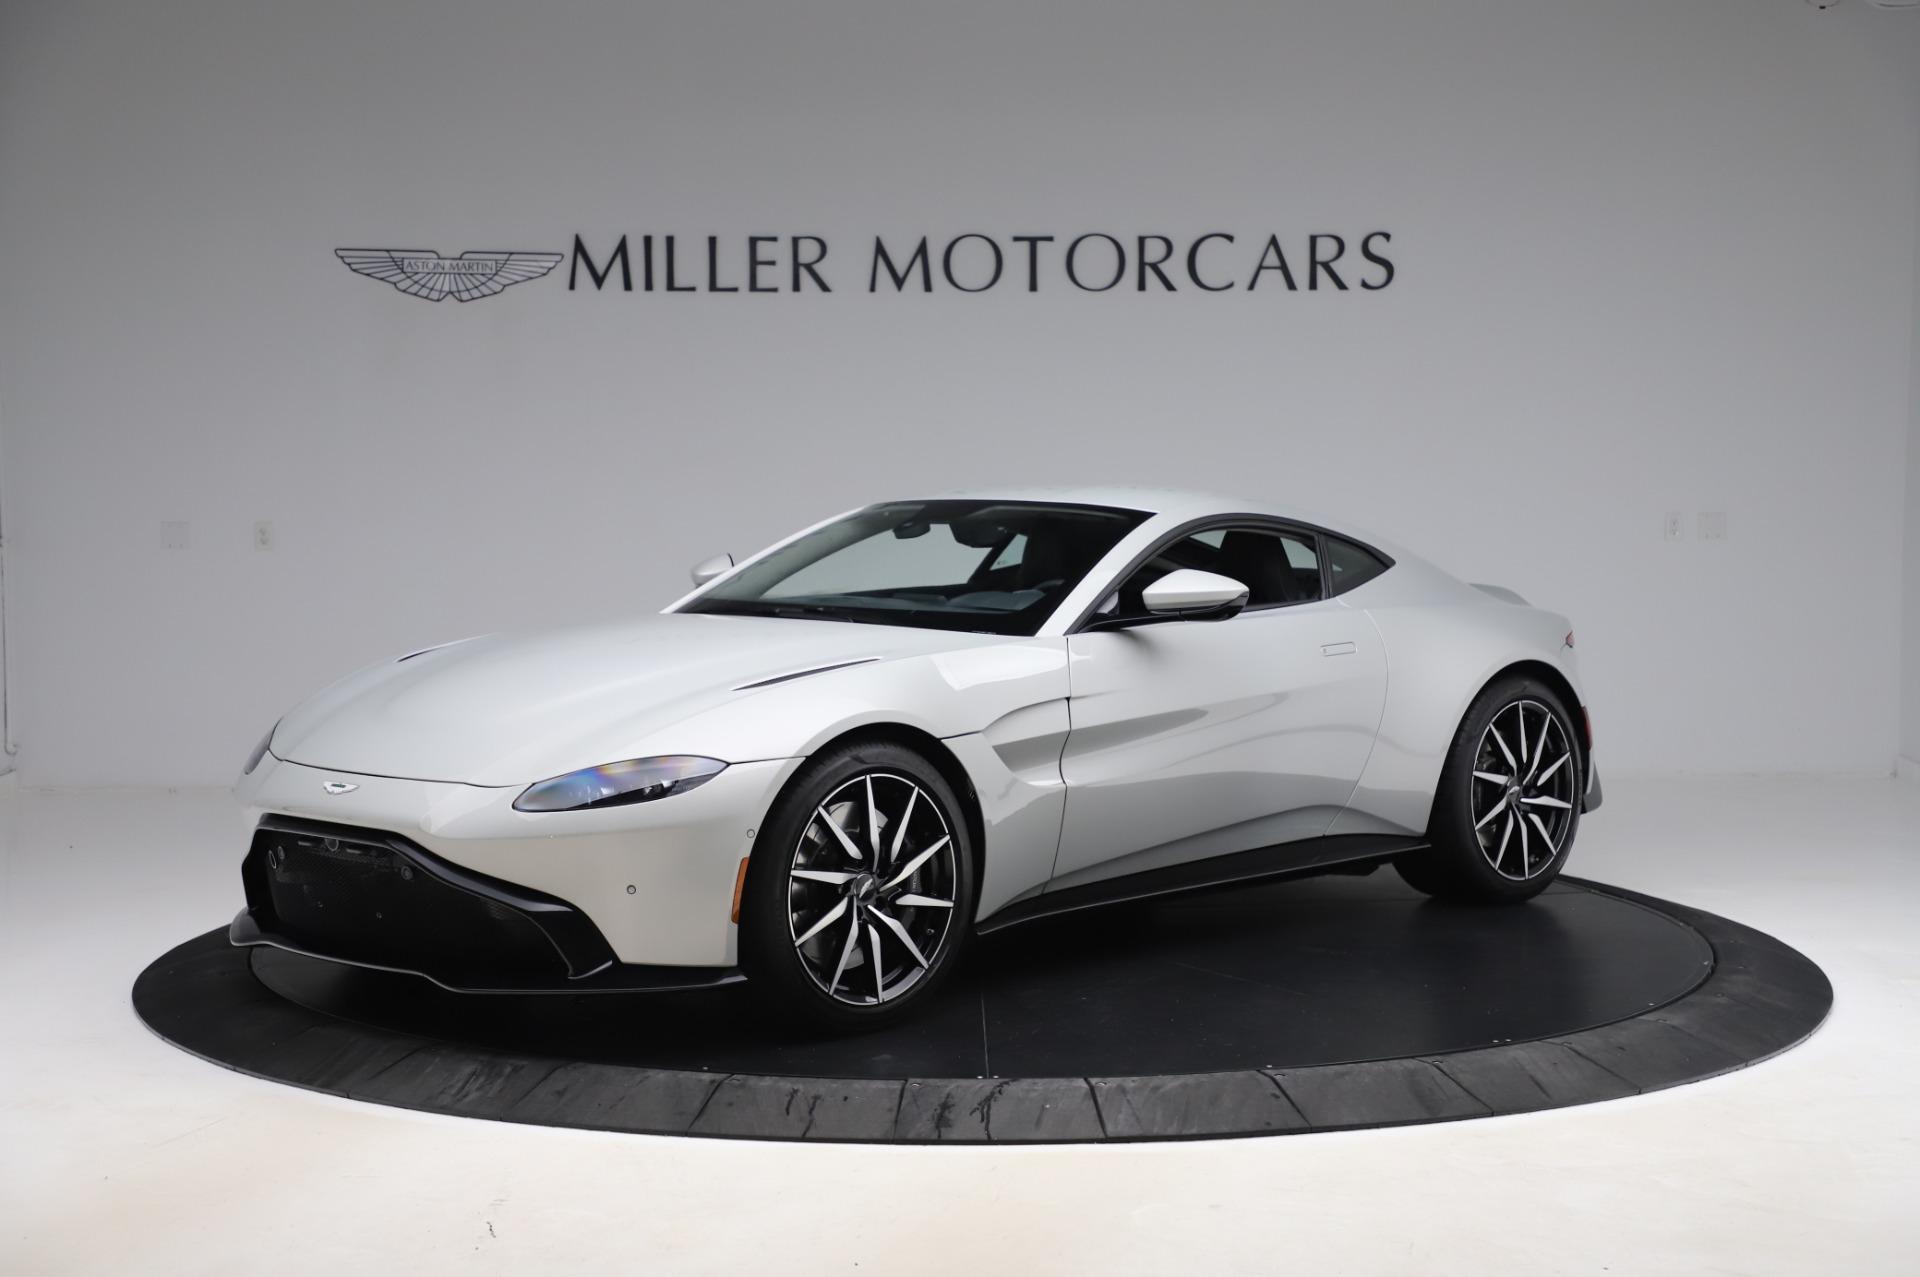 Used 2020 Aston Martin Vantage for sale $149,900 at Bugatti of Greenwich in Greenwich CT 06830 1